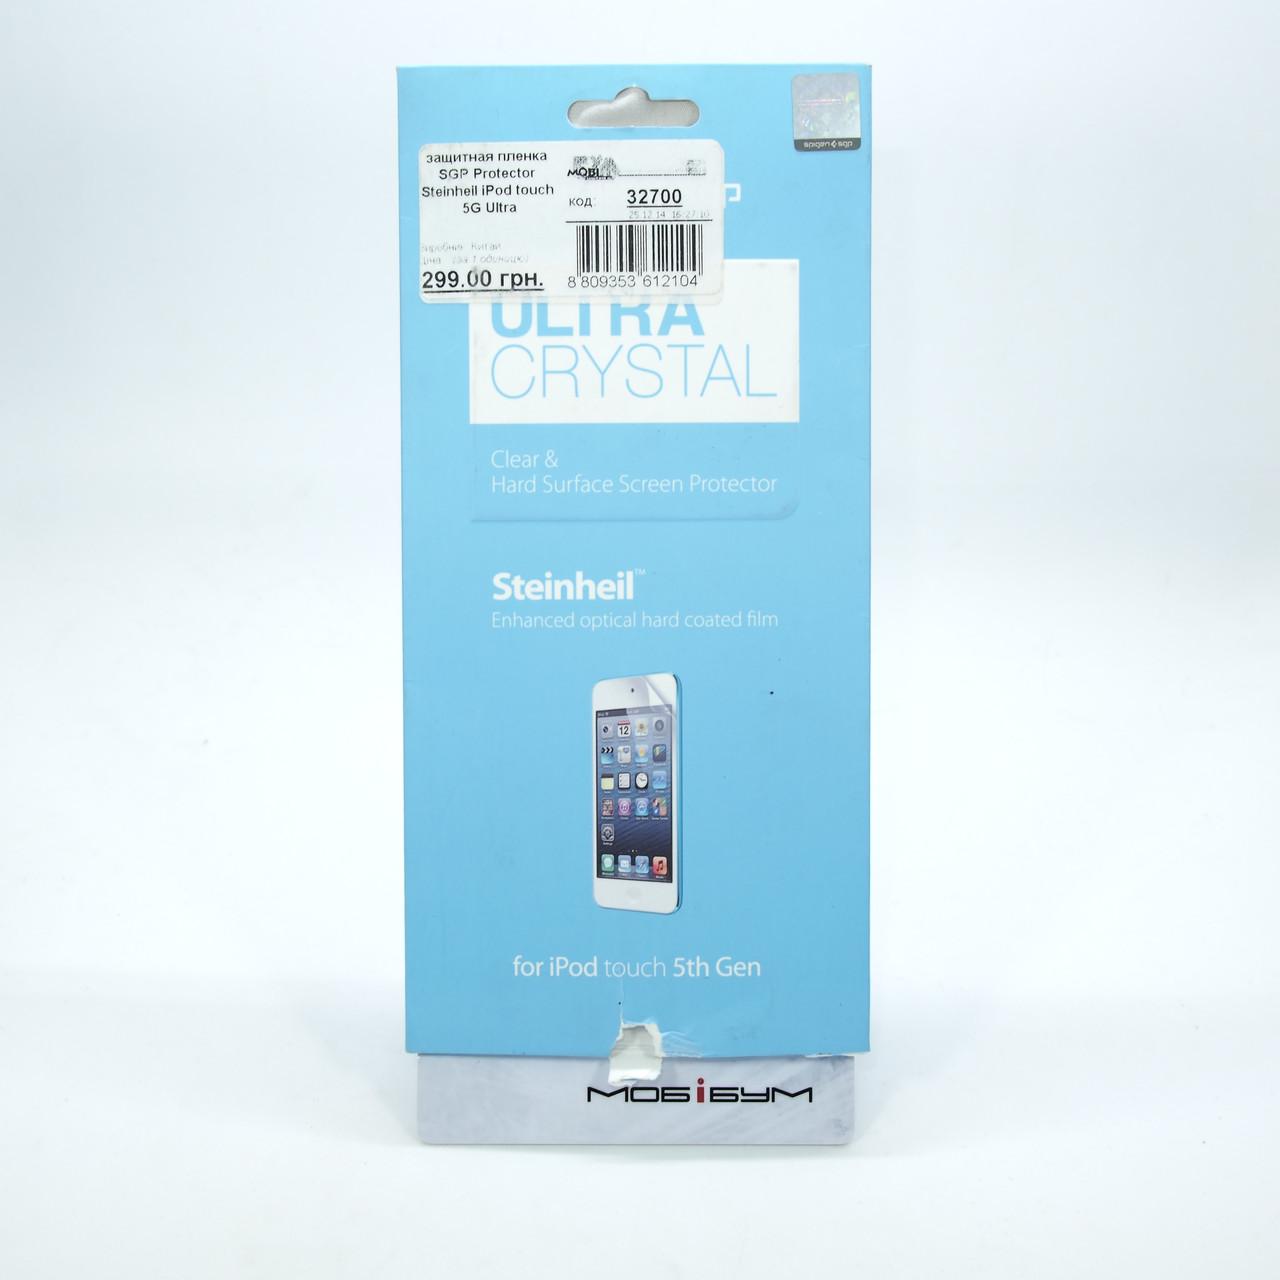 Защитная пленка Spigen Protector Steinheil iPod touch 5G Ultra Crystal [SGP09545] EAN/UPC: 880935361210